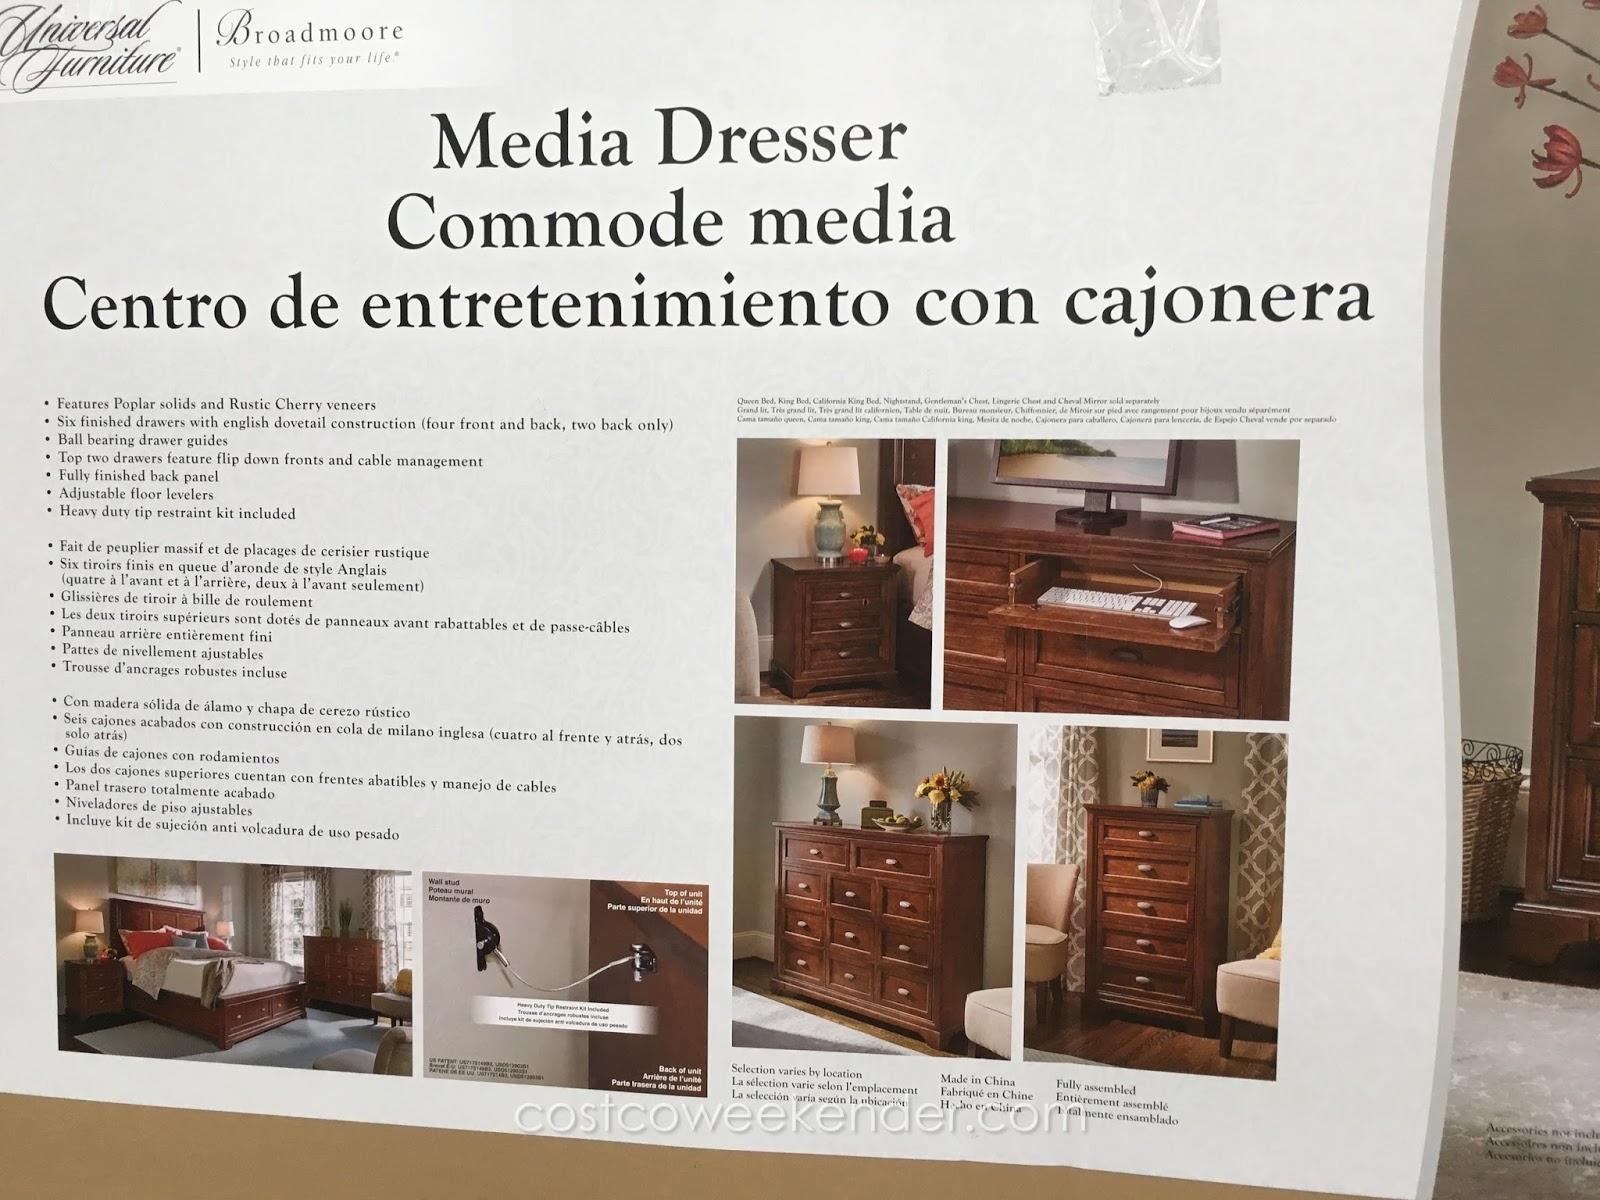 Media Dresser Costco BestDressers 2017